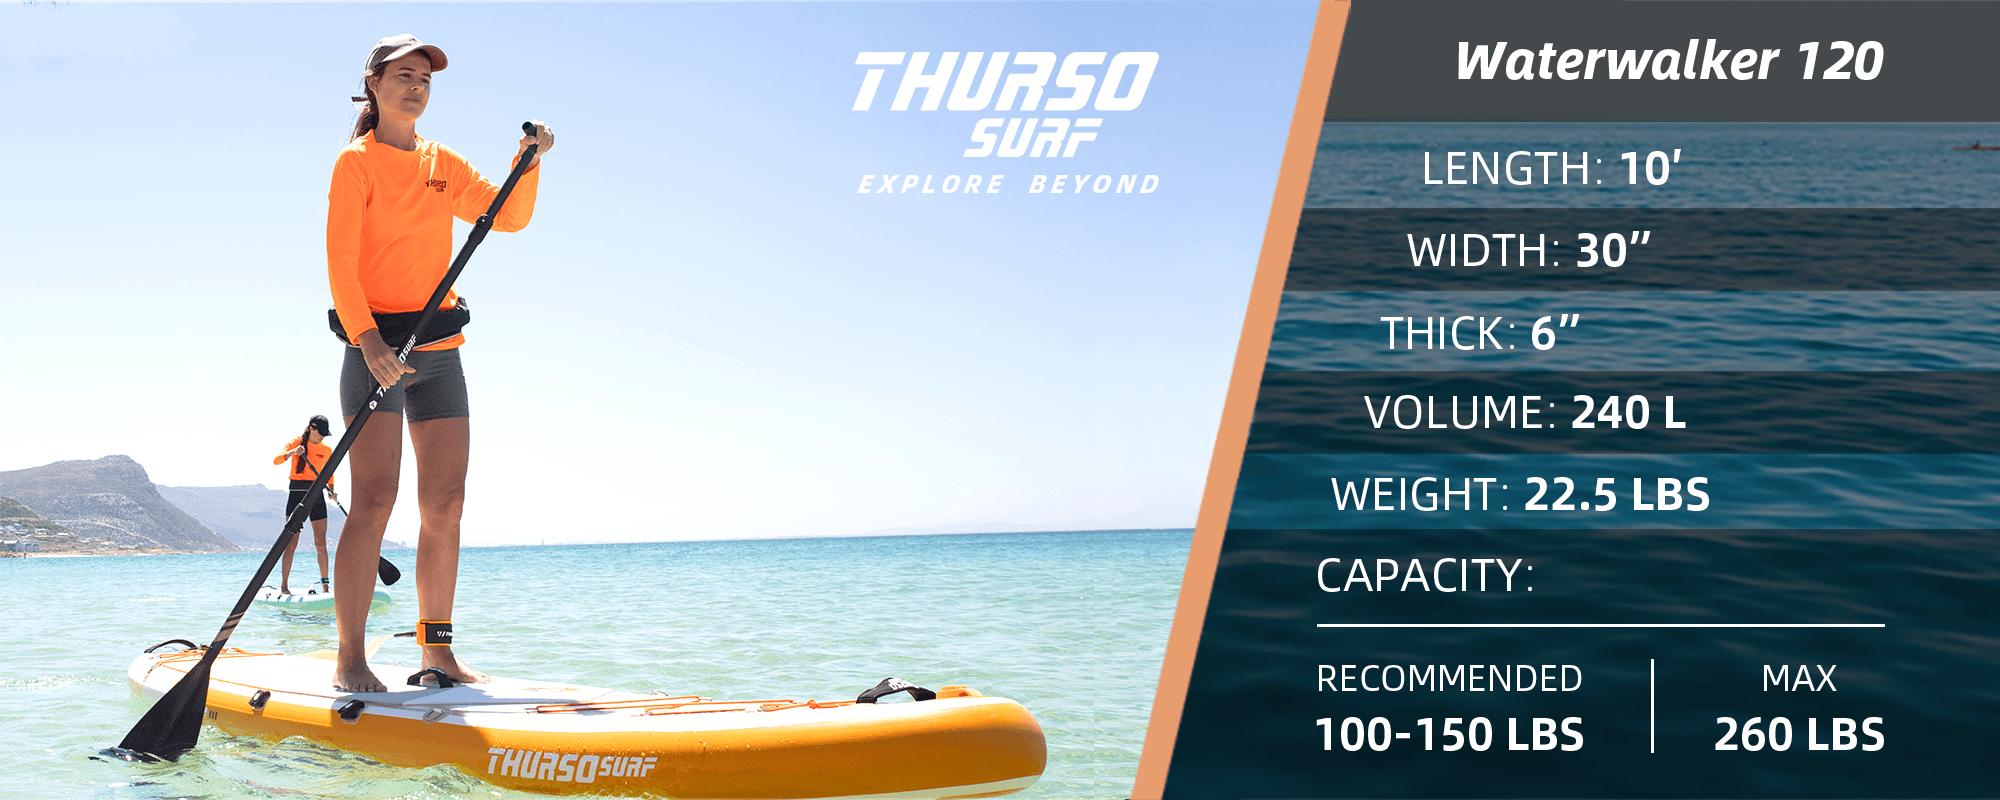 Thurso-Surf-Waterwalker-120-2021-specs